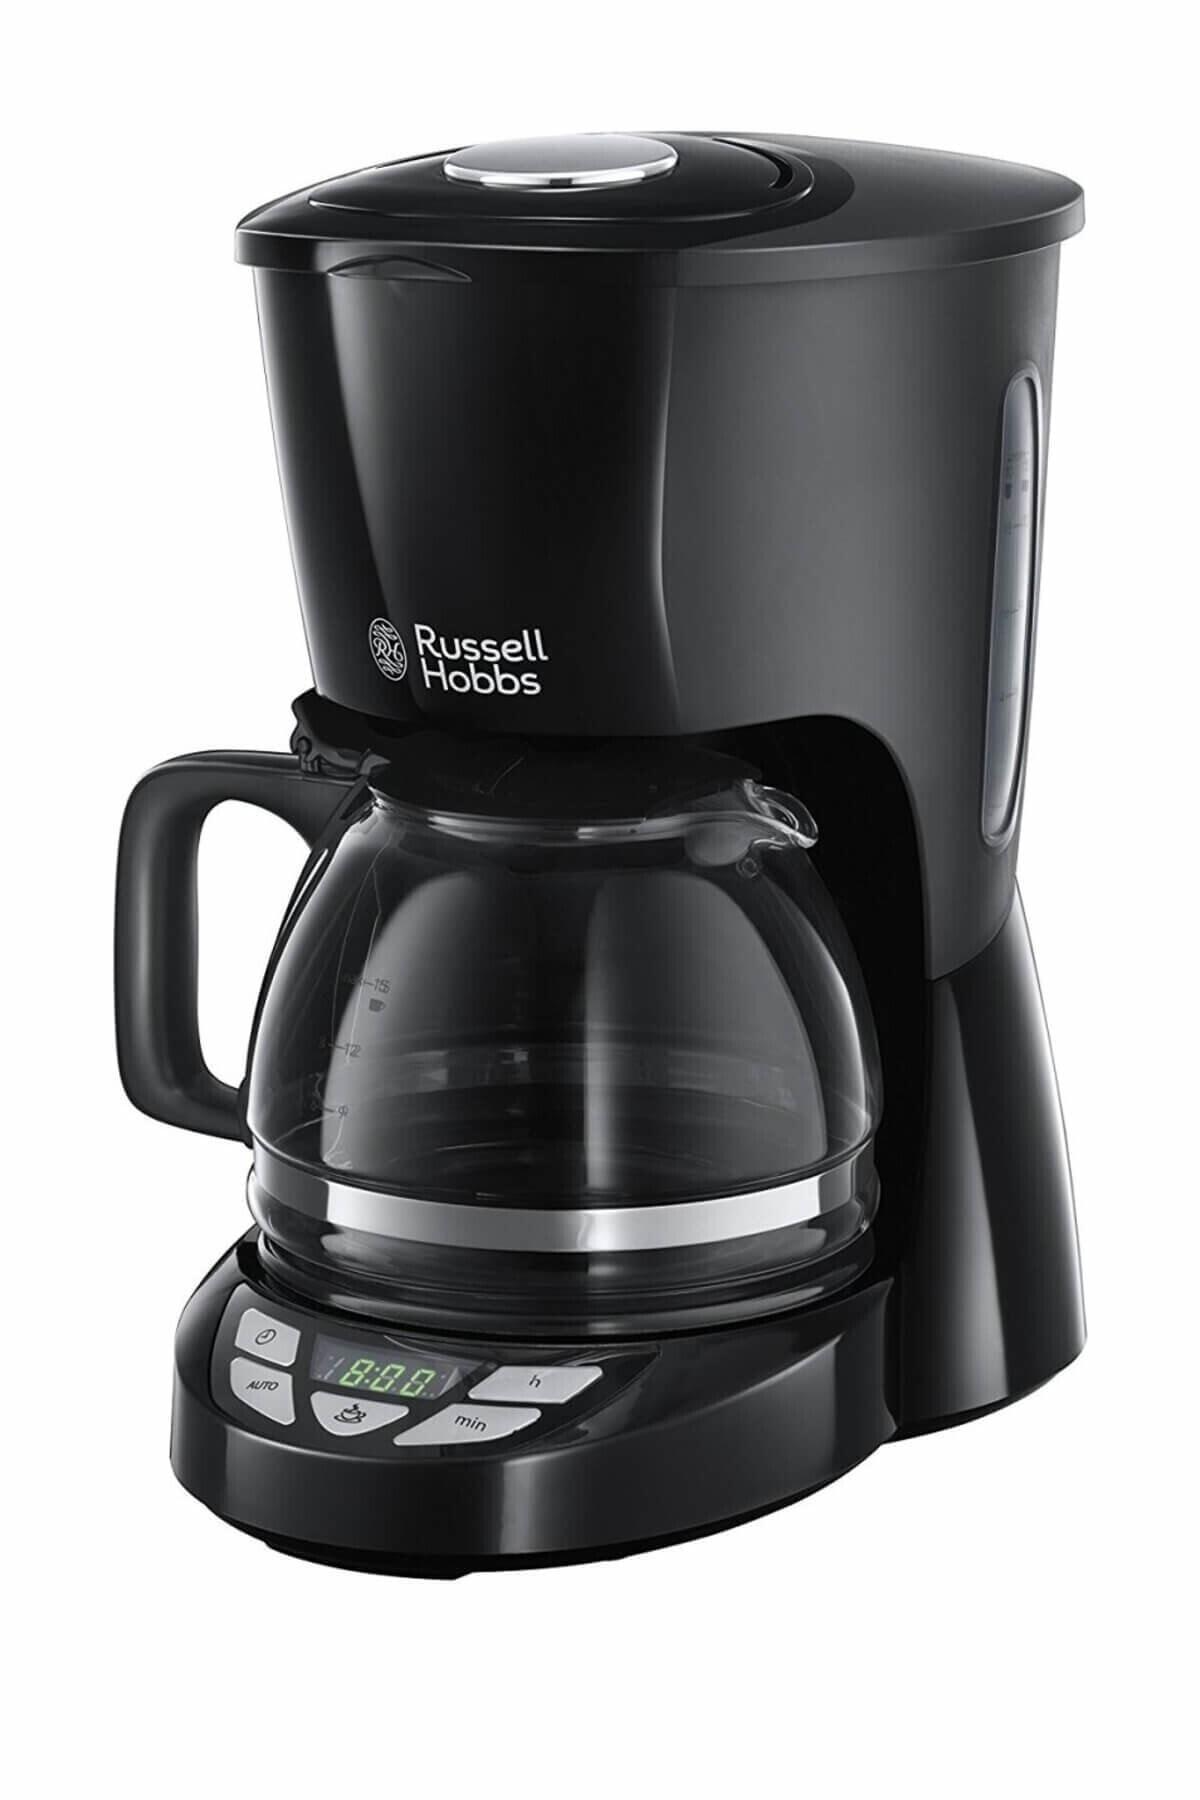 RUSSELL HOBBS Dijital Zaman Ayarlı Filtre Kahve Makinesi 1